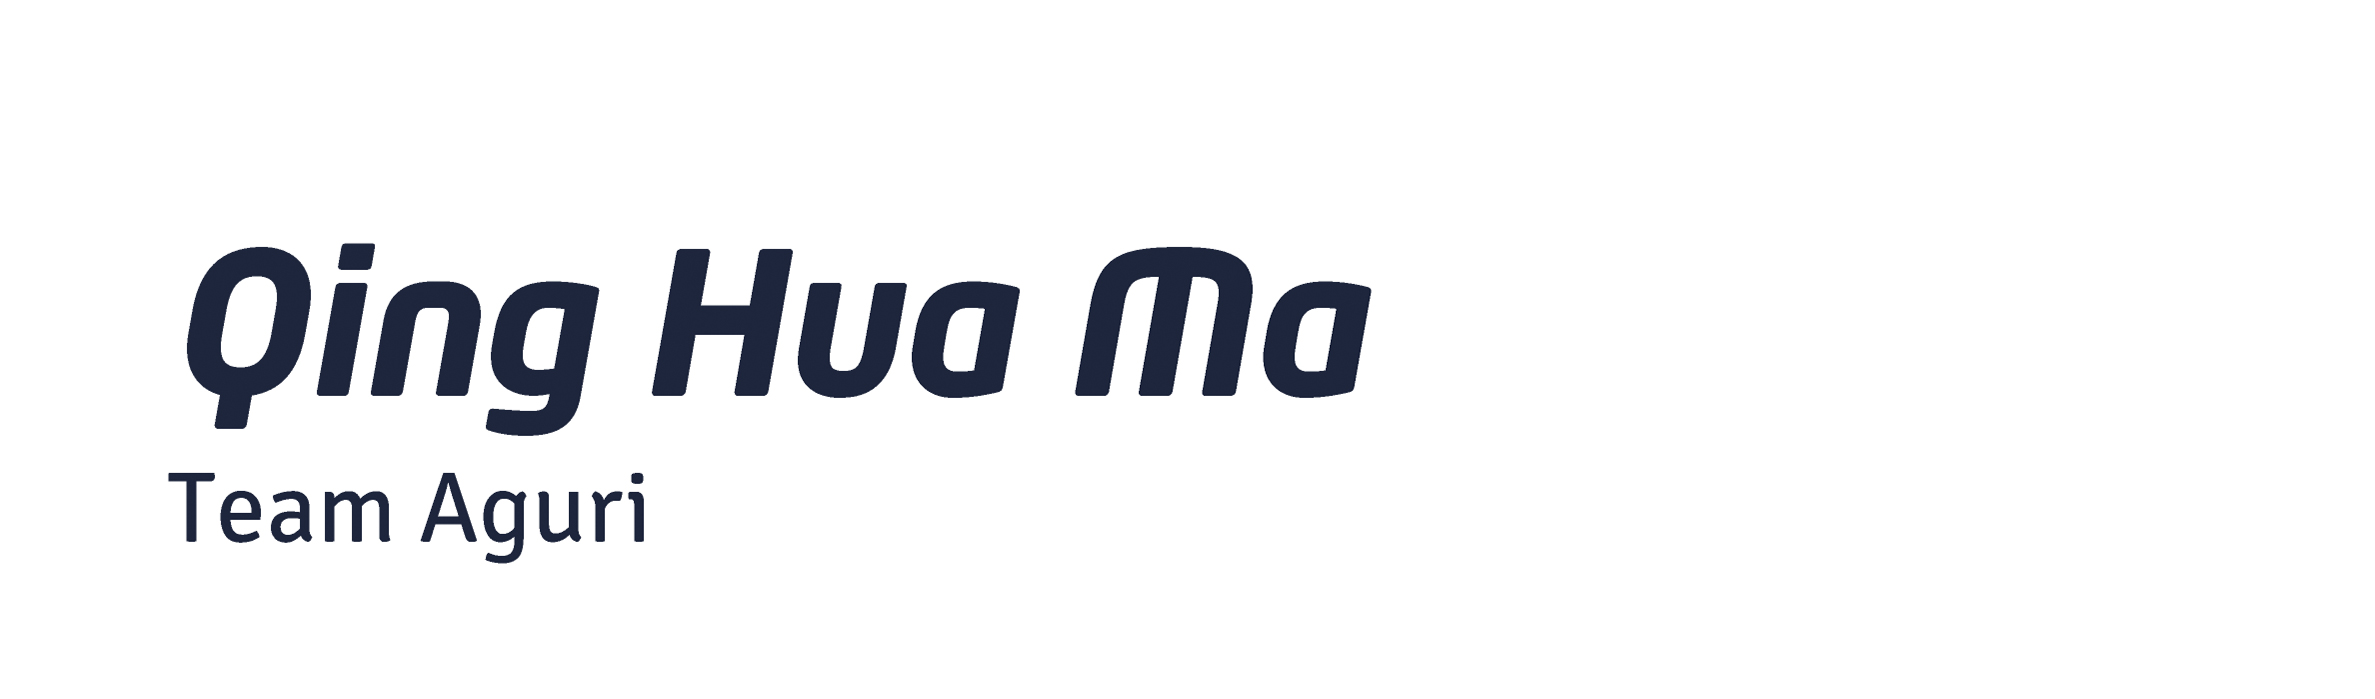 Ma_01